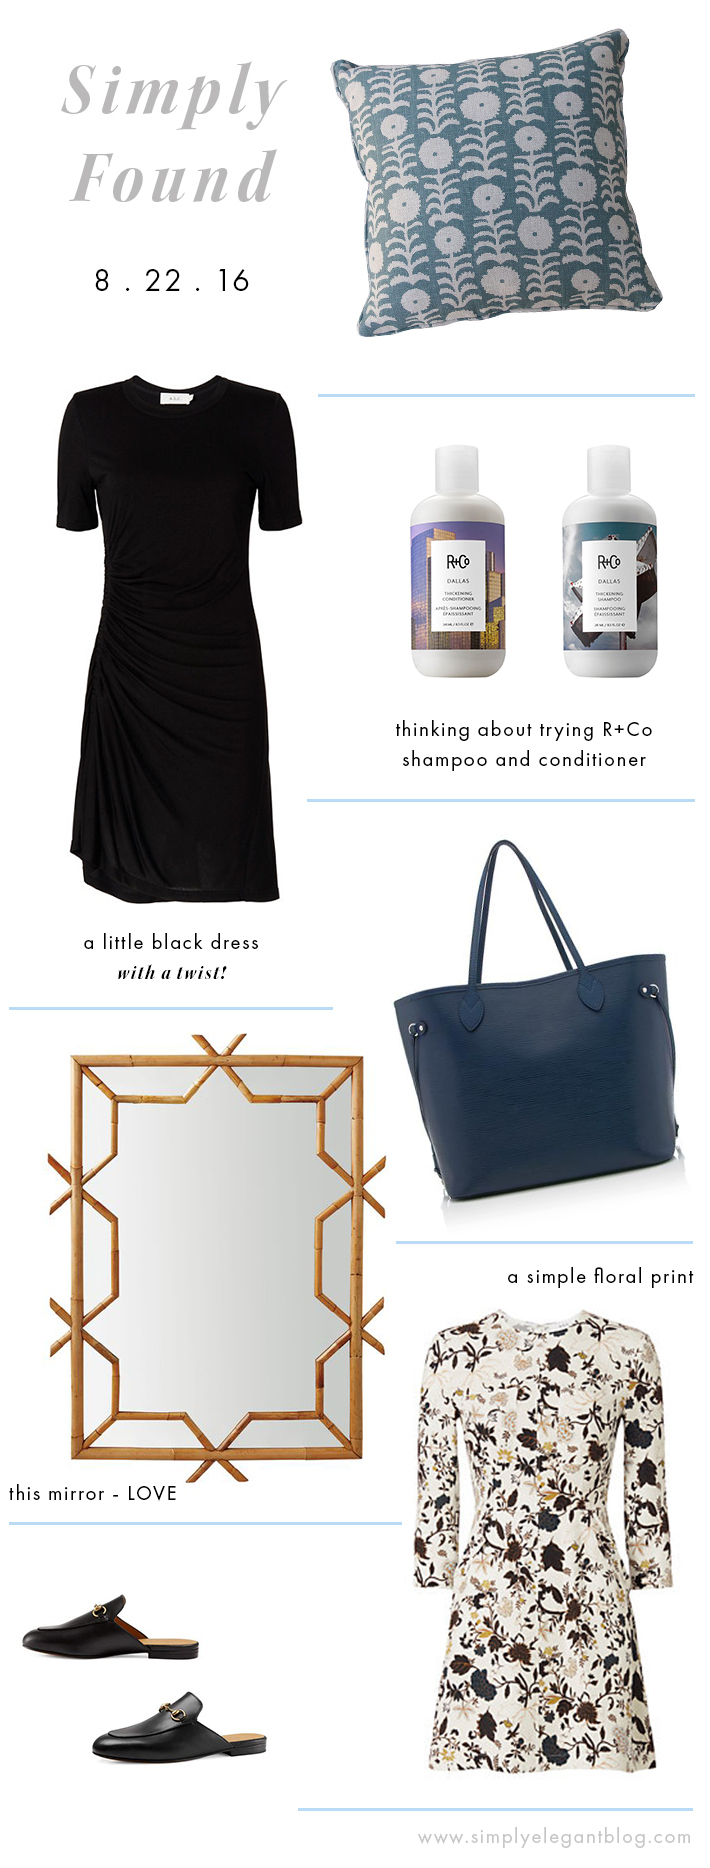 Simply Found 11. Shopping Wish List. Amber Interiors Pillow. R+Co Shampoo. Epi Neverfull Bag.  Gucci Horsebit Mules.